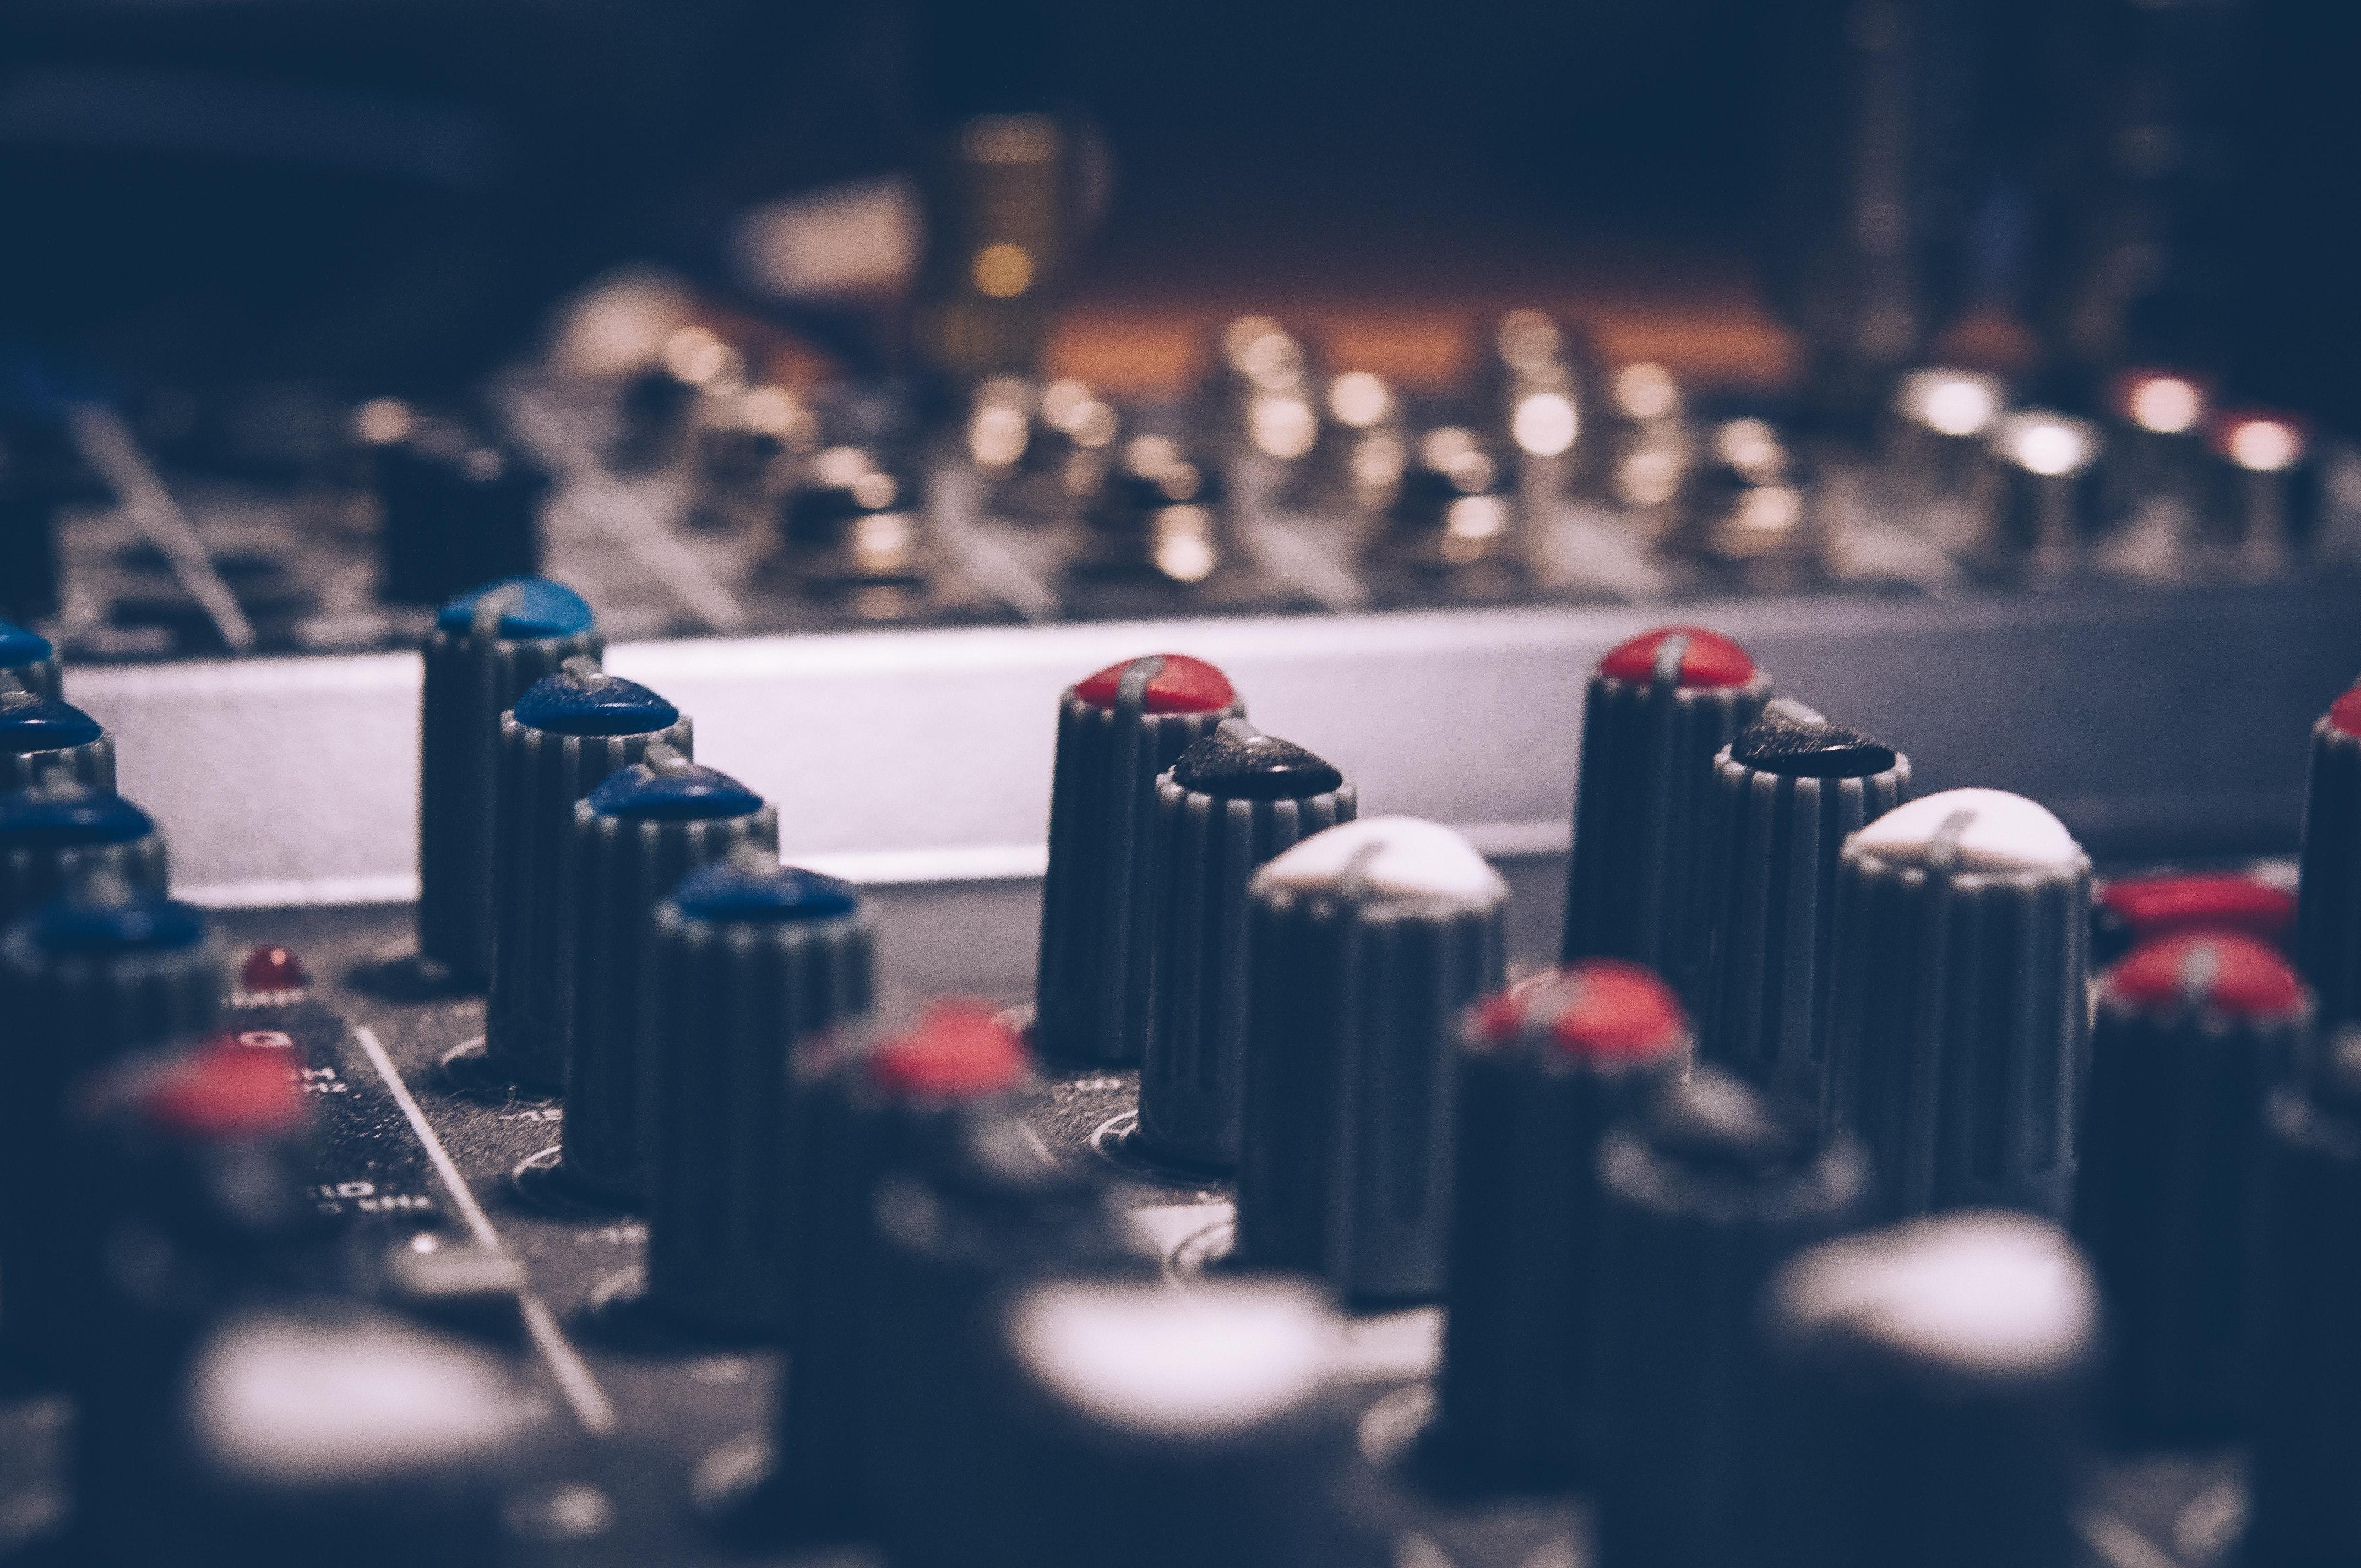 Free photo: Macro Shot Audio Equalizer - Music, Mixing panel, Mixer